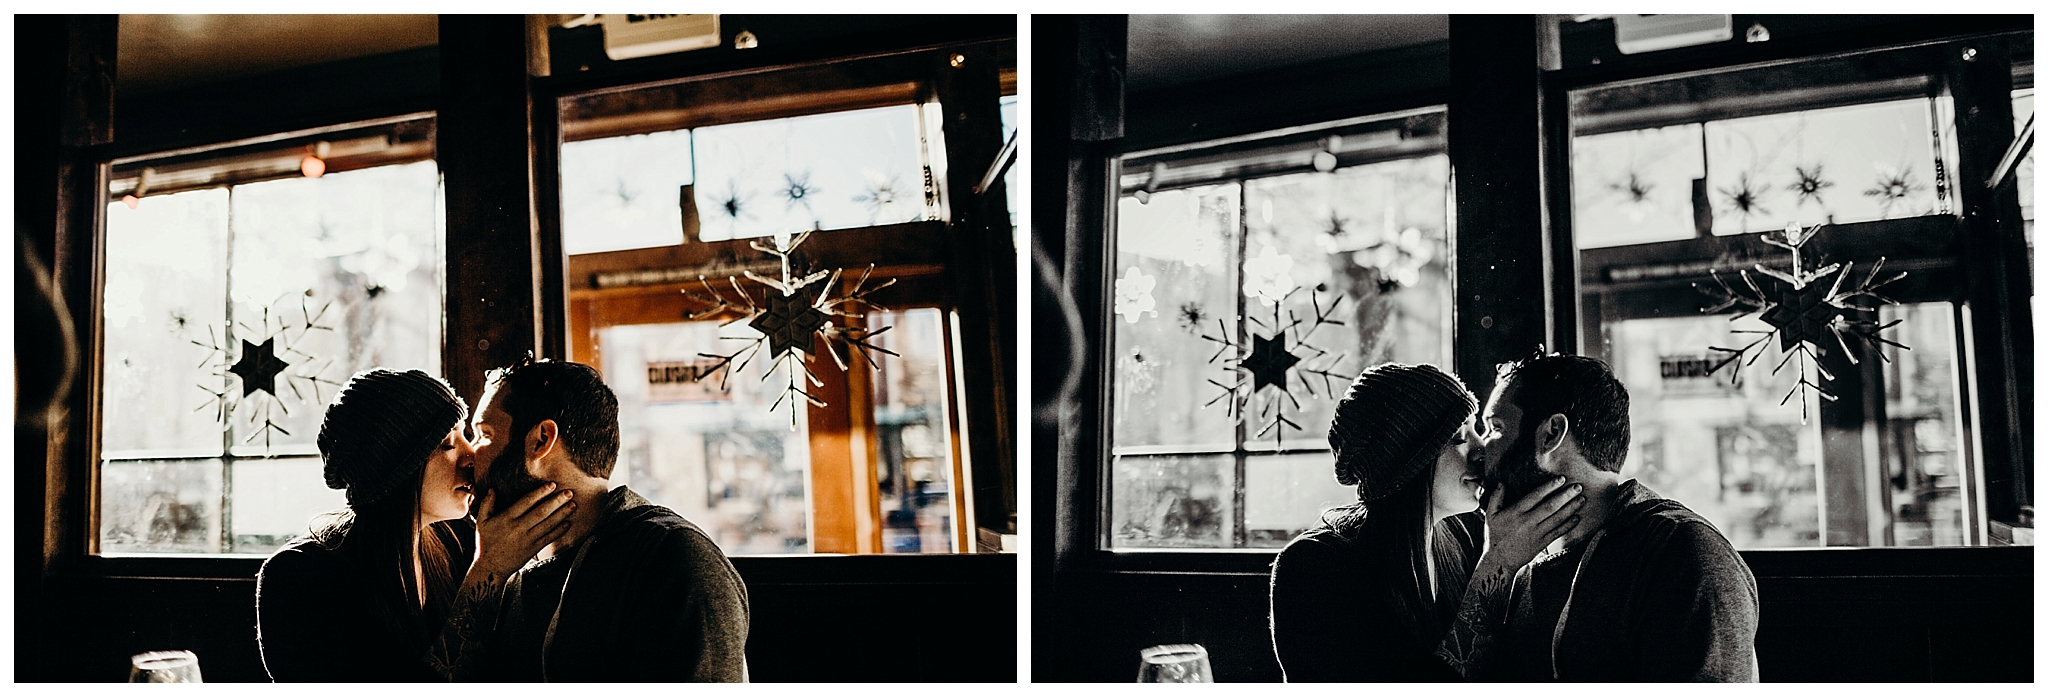 breckenridge-denver-colorado-utah-lifestyle-engagement-elopement-wedding-potographer-5.jpg